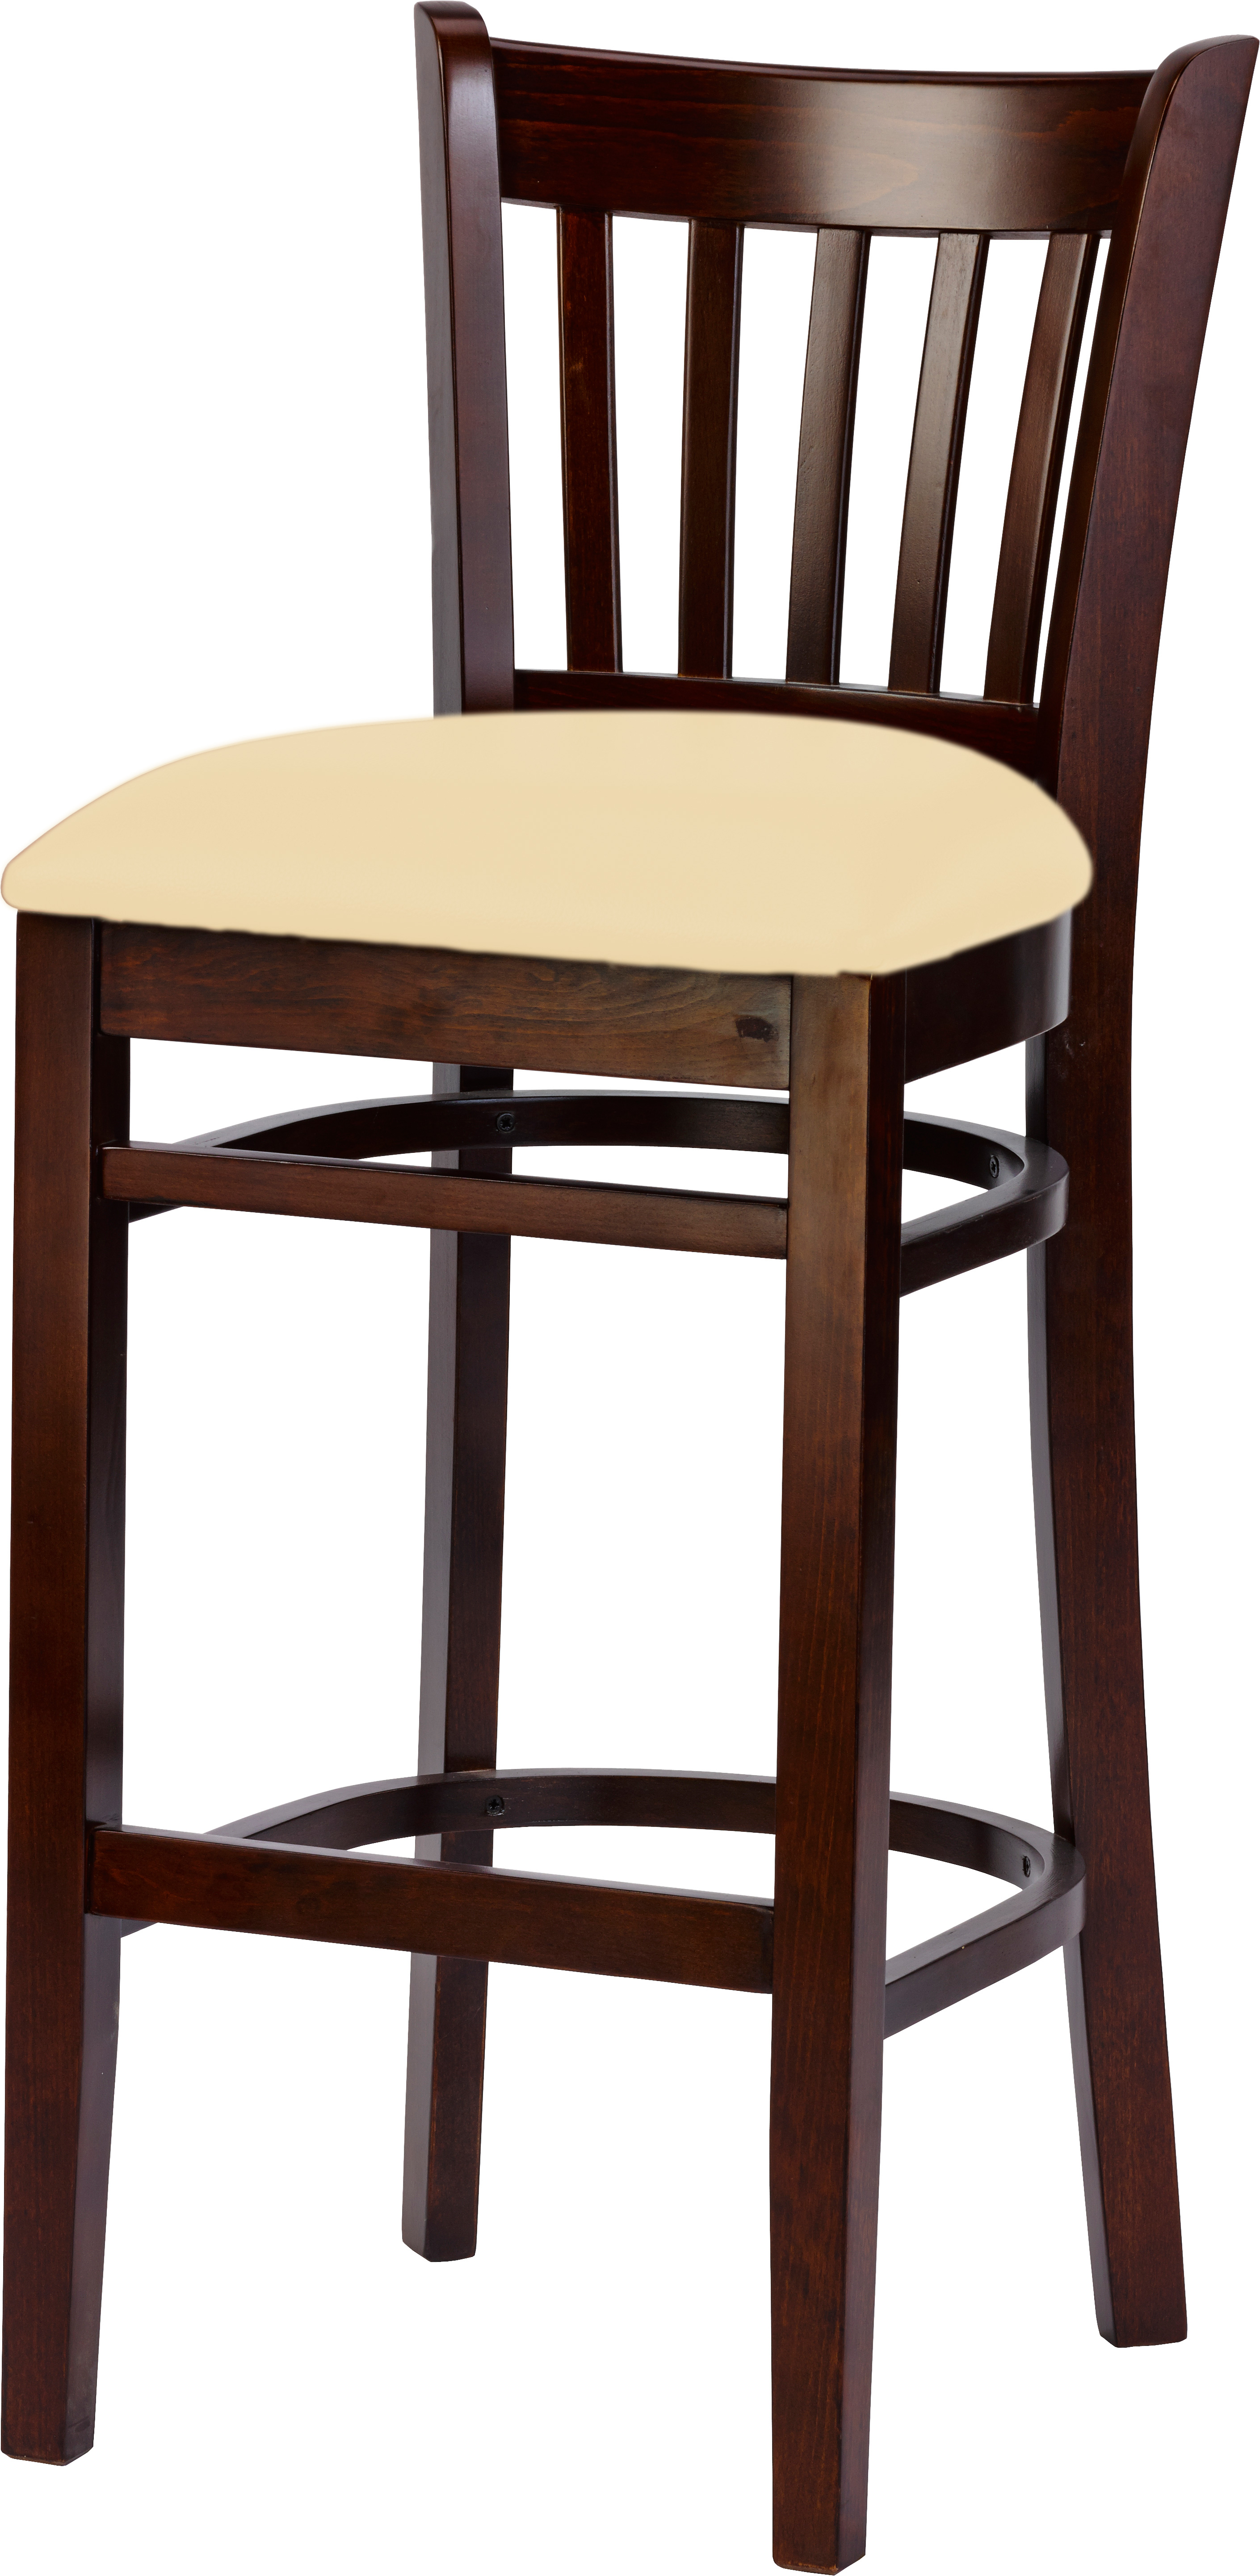 gastronomie cafe barhocker lana aus holz sitzpolsterung in m bel star. Black Bedroom Furniture Sets. Home Design Ideas